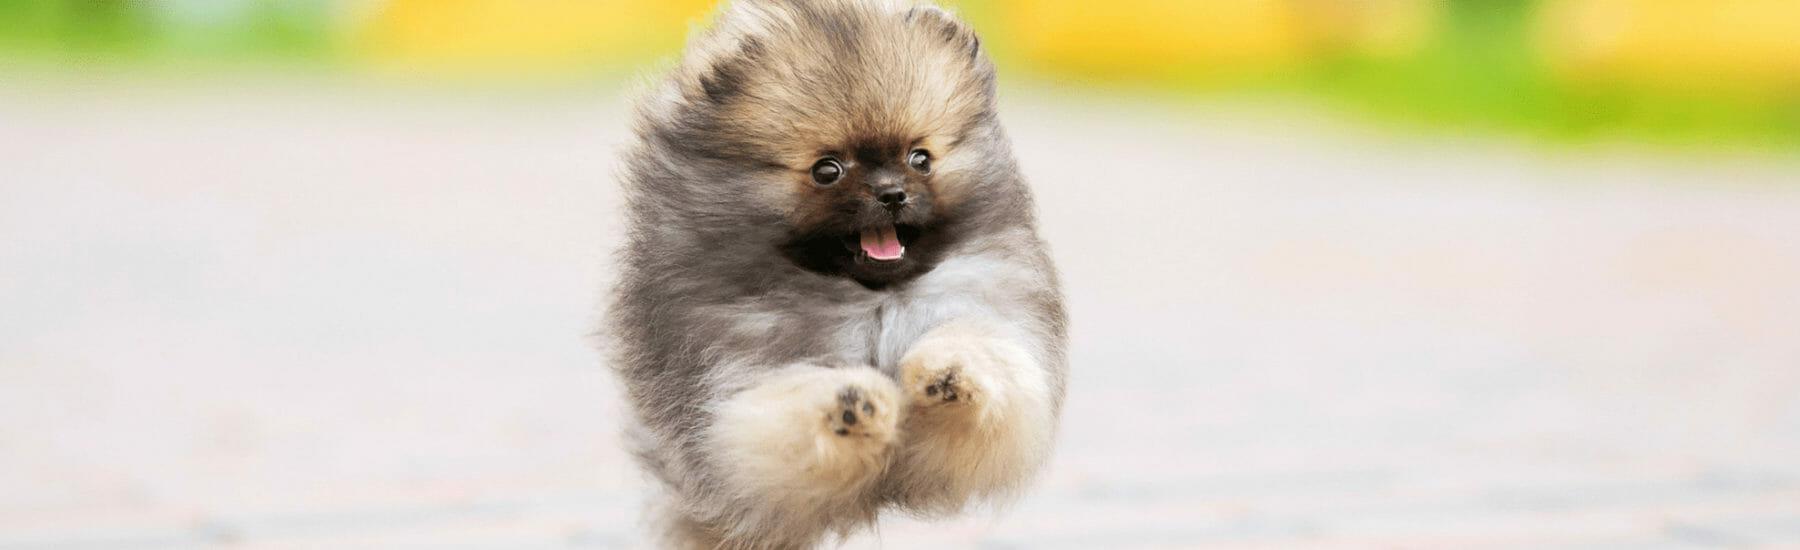 Fluffy dog jumping towards camera